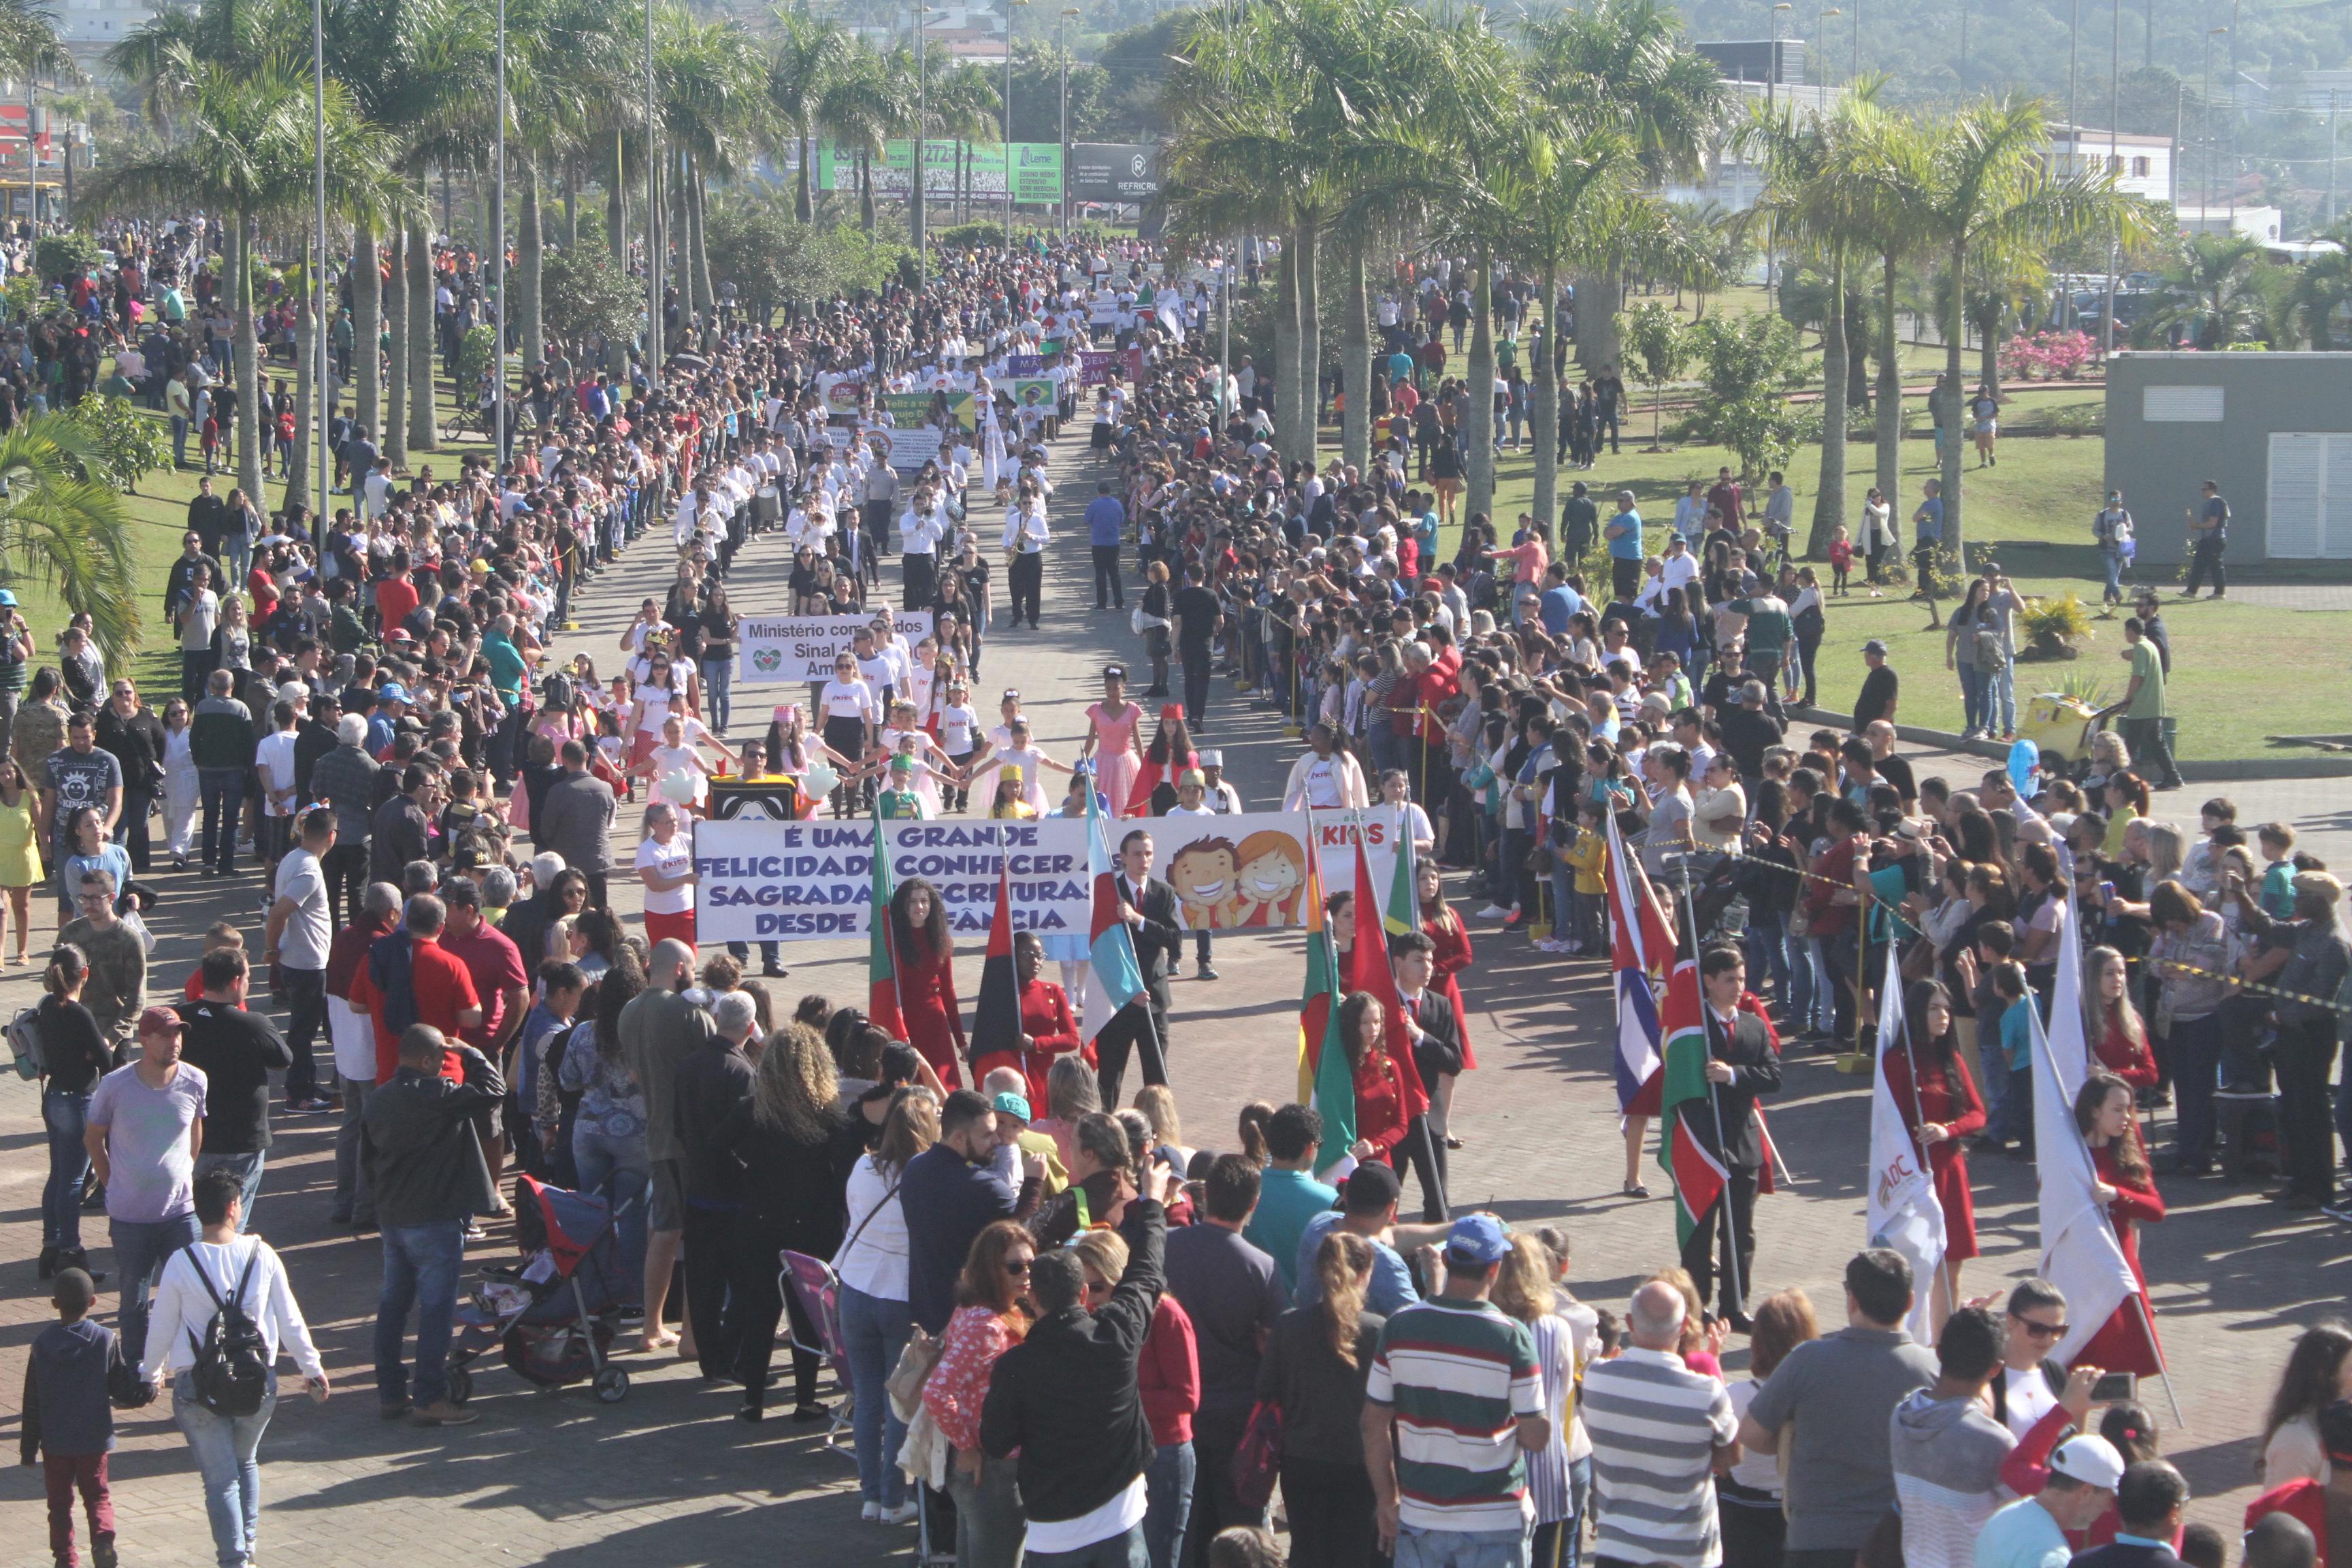 Lucas-Colombo-Desfile-de-7-de-Setembro-Parque-das-Nções-33